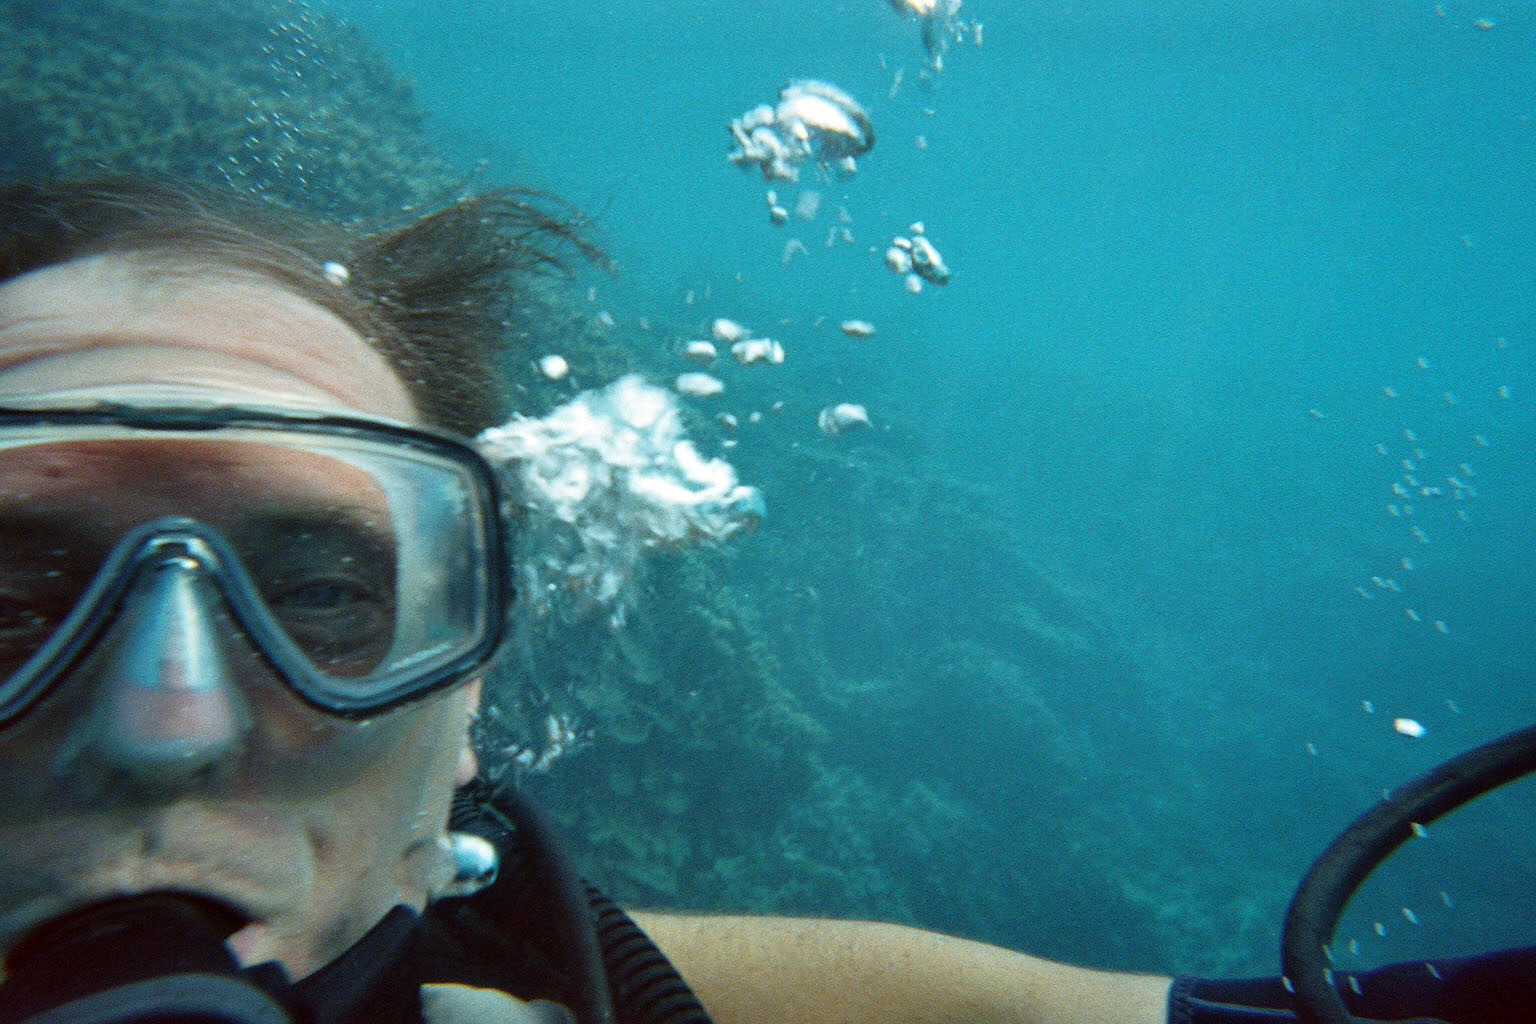 Plongée dans le lagon de tahaa